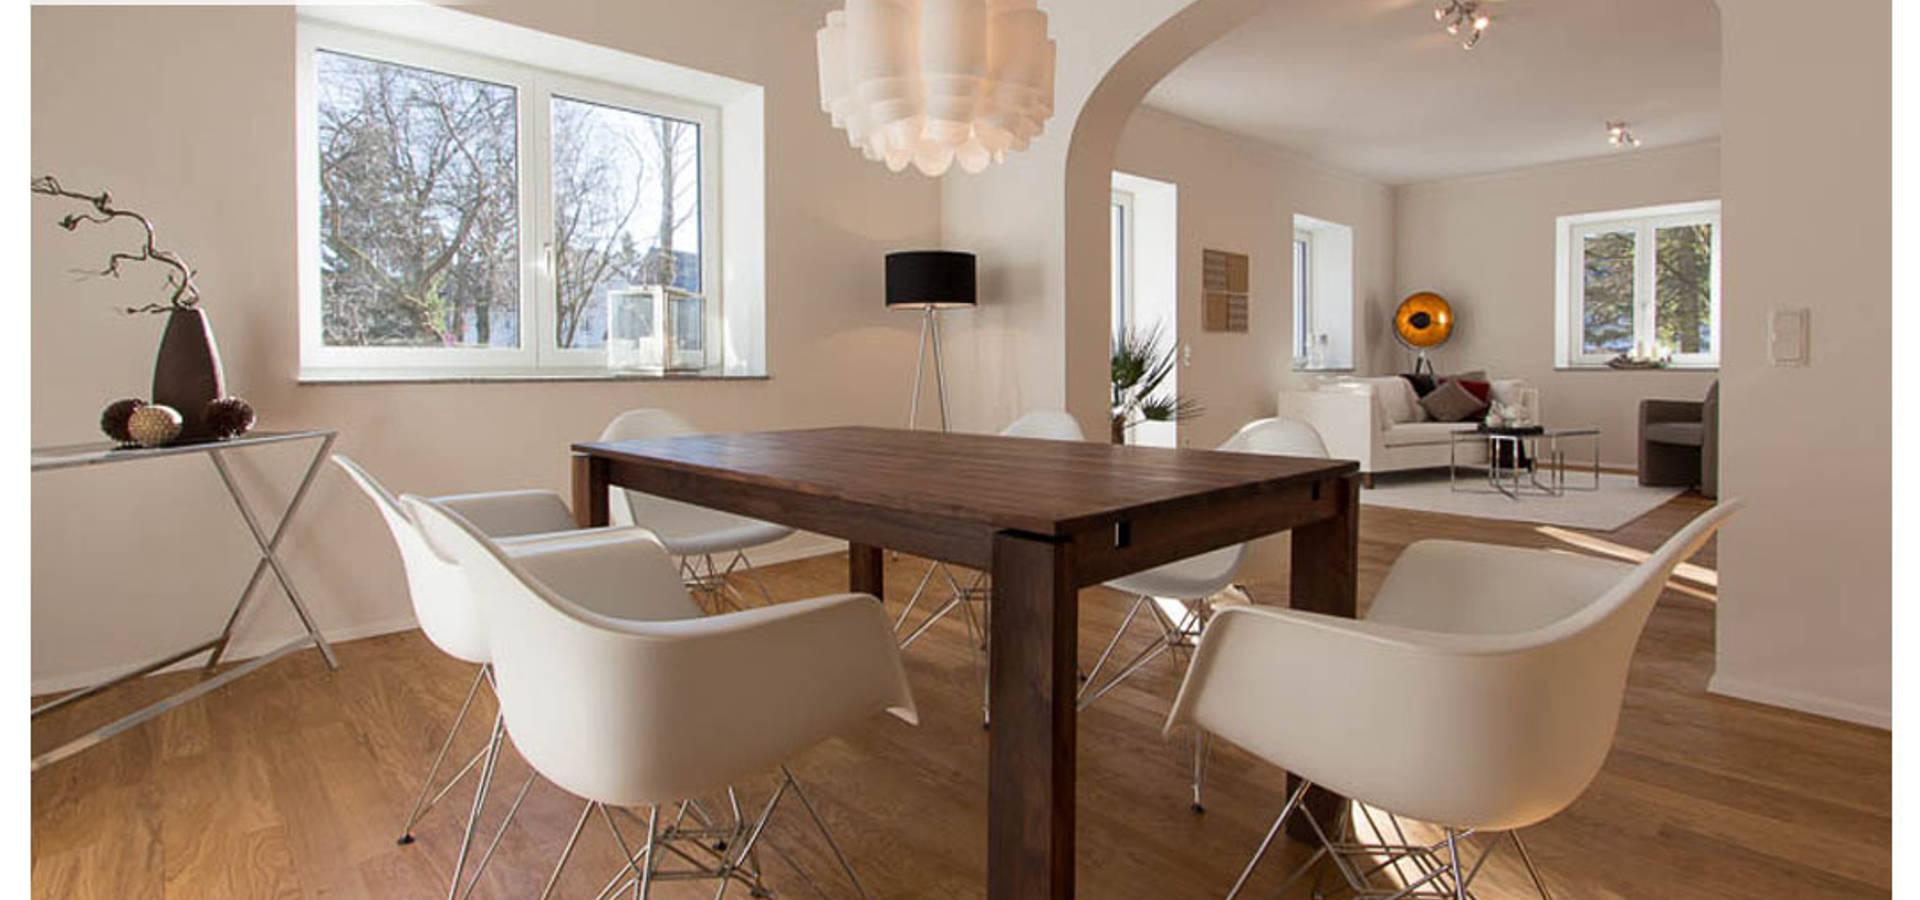 home staging musterwohnung m nchen von m nchner home. Black Bedroom Furniture Sets. Home Design Ideas